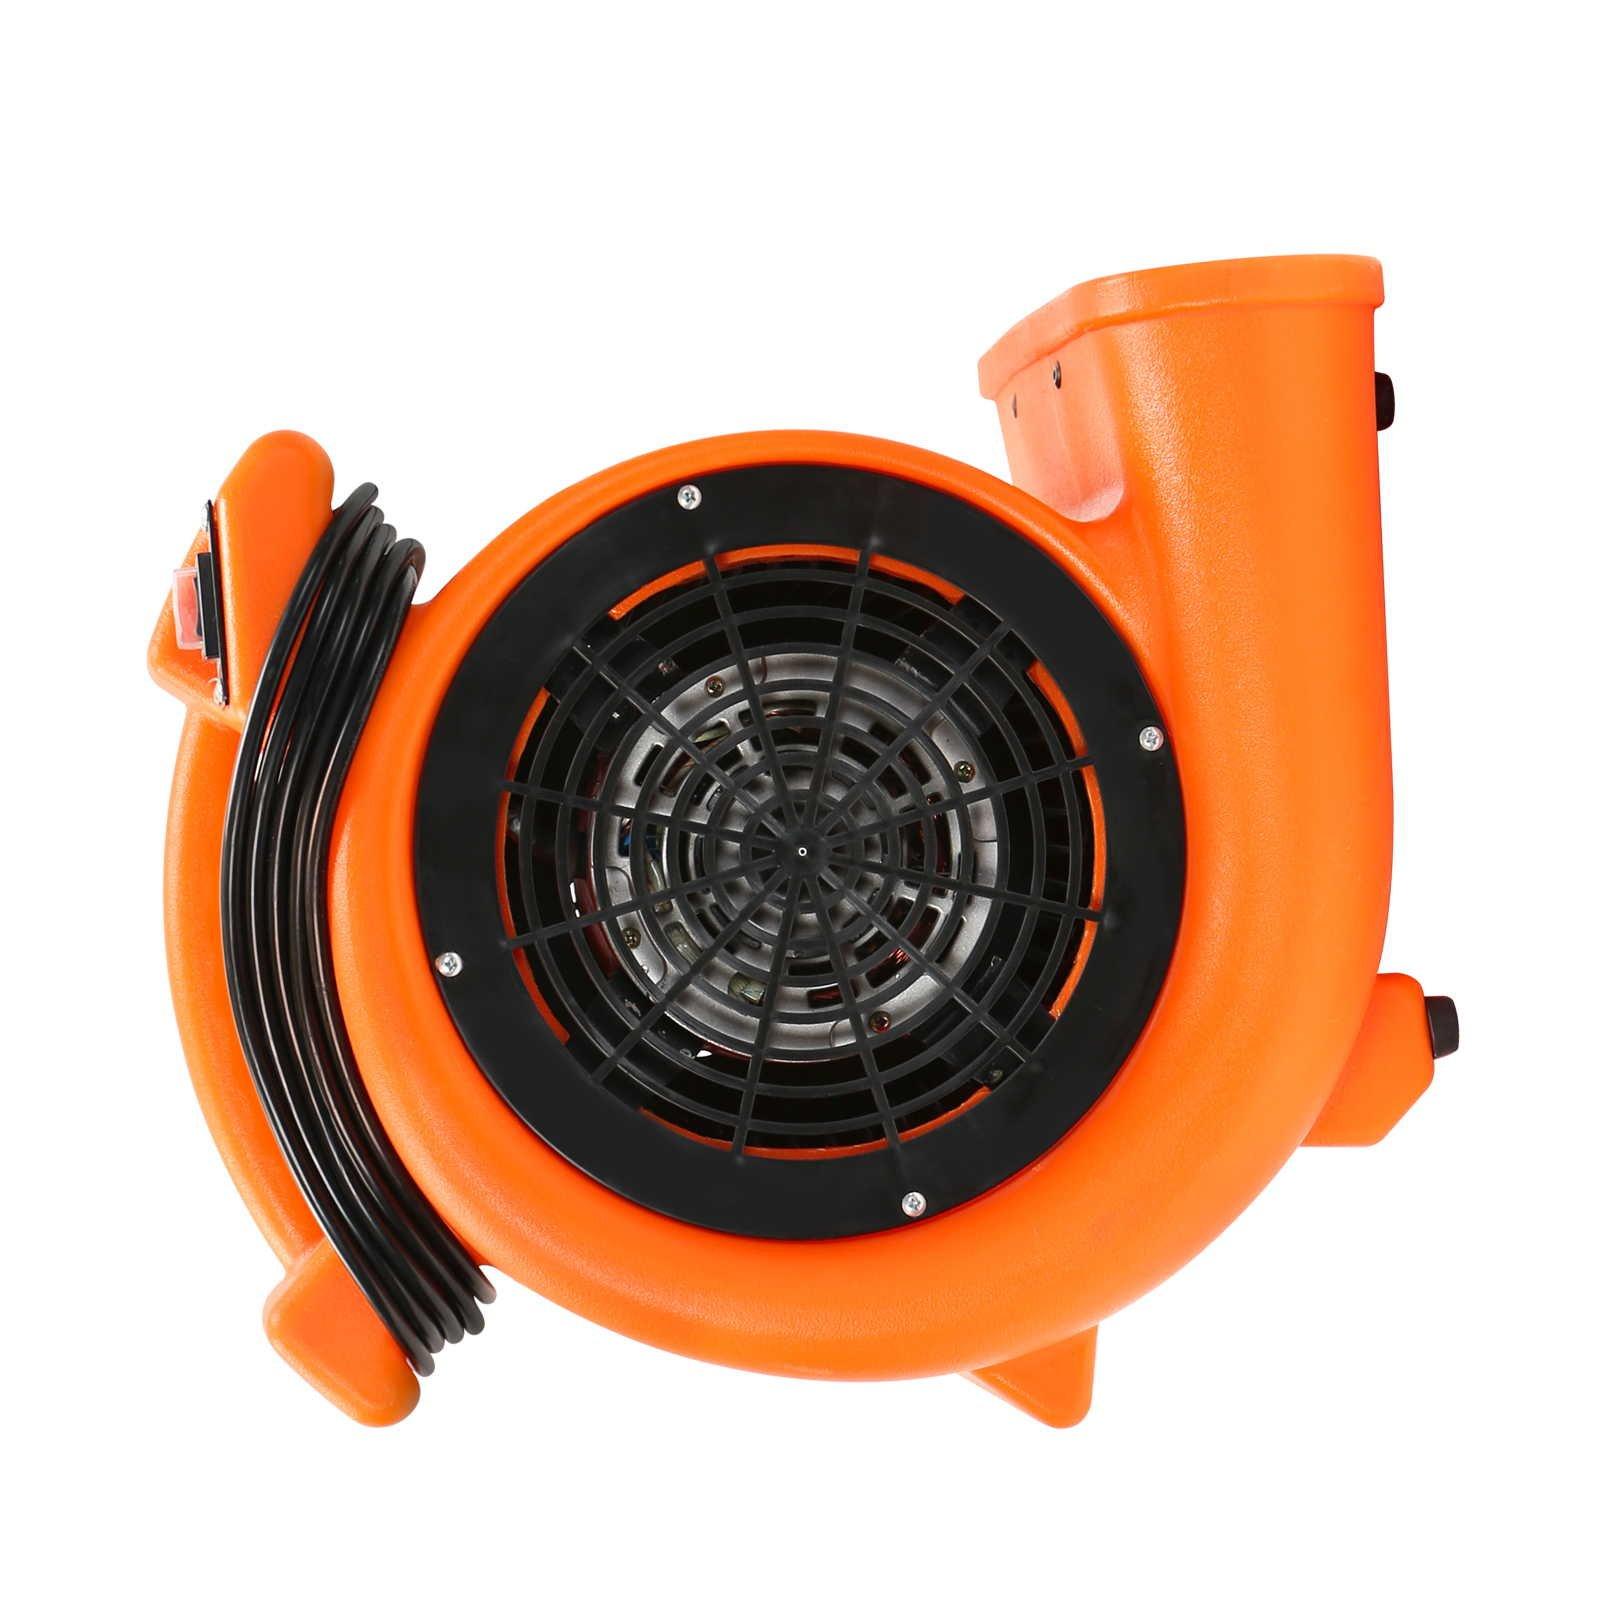 CFM Pro Air Mover Carpet Floor Dryer 2 Speed 1/2 HP Blower Fan - Orange - Industrial Water Flood Damage Restoration by CFM Pro (Image #4)